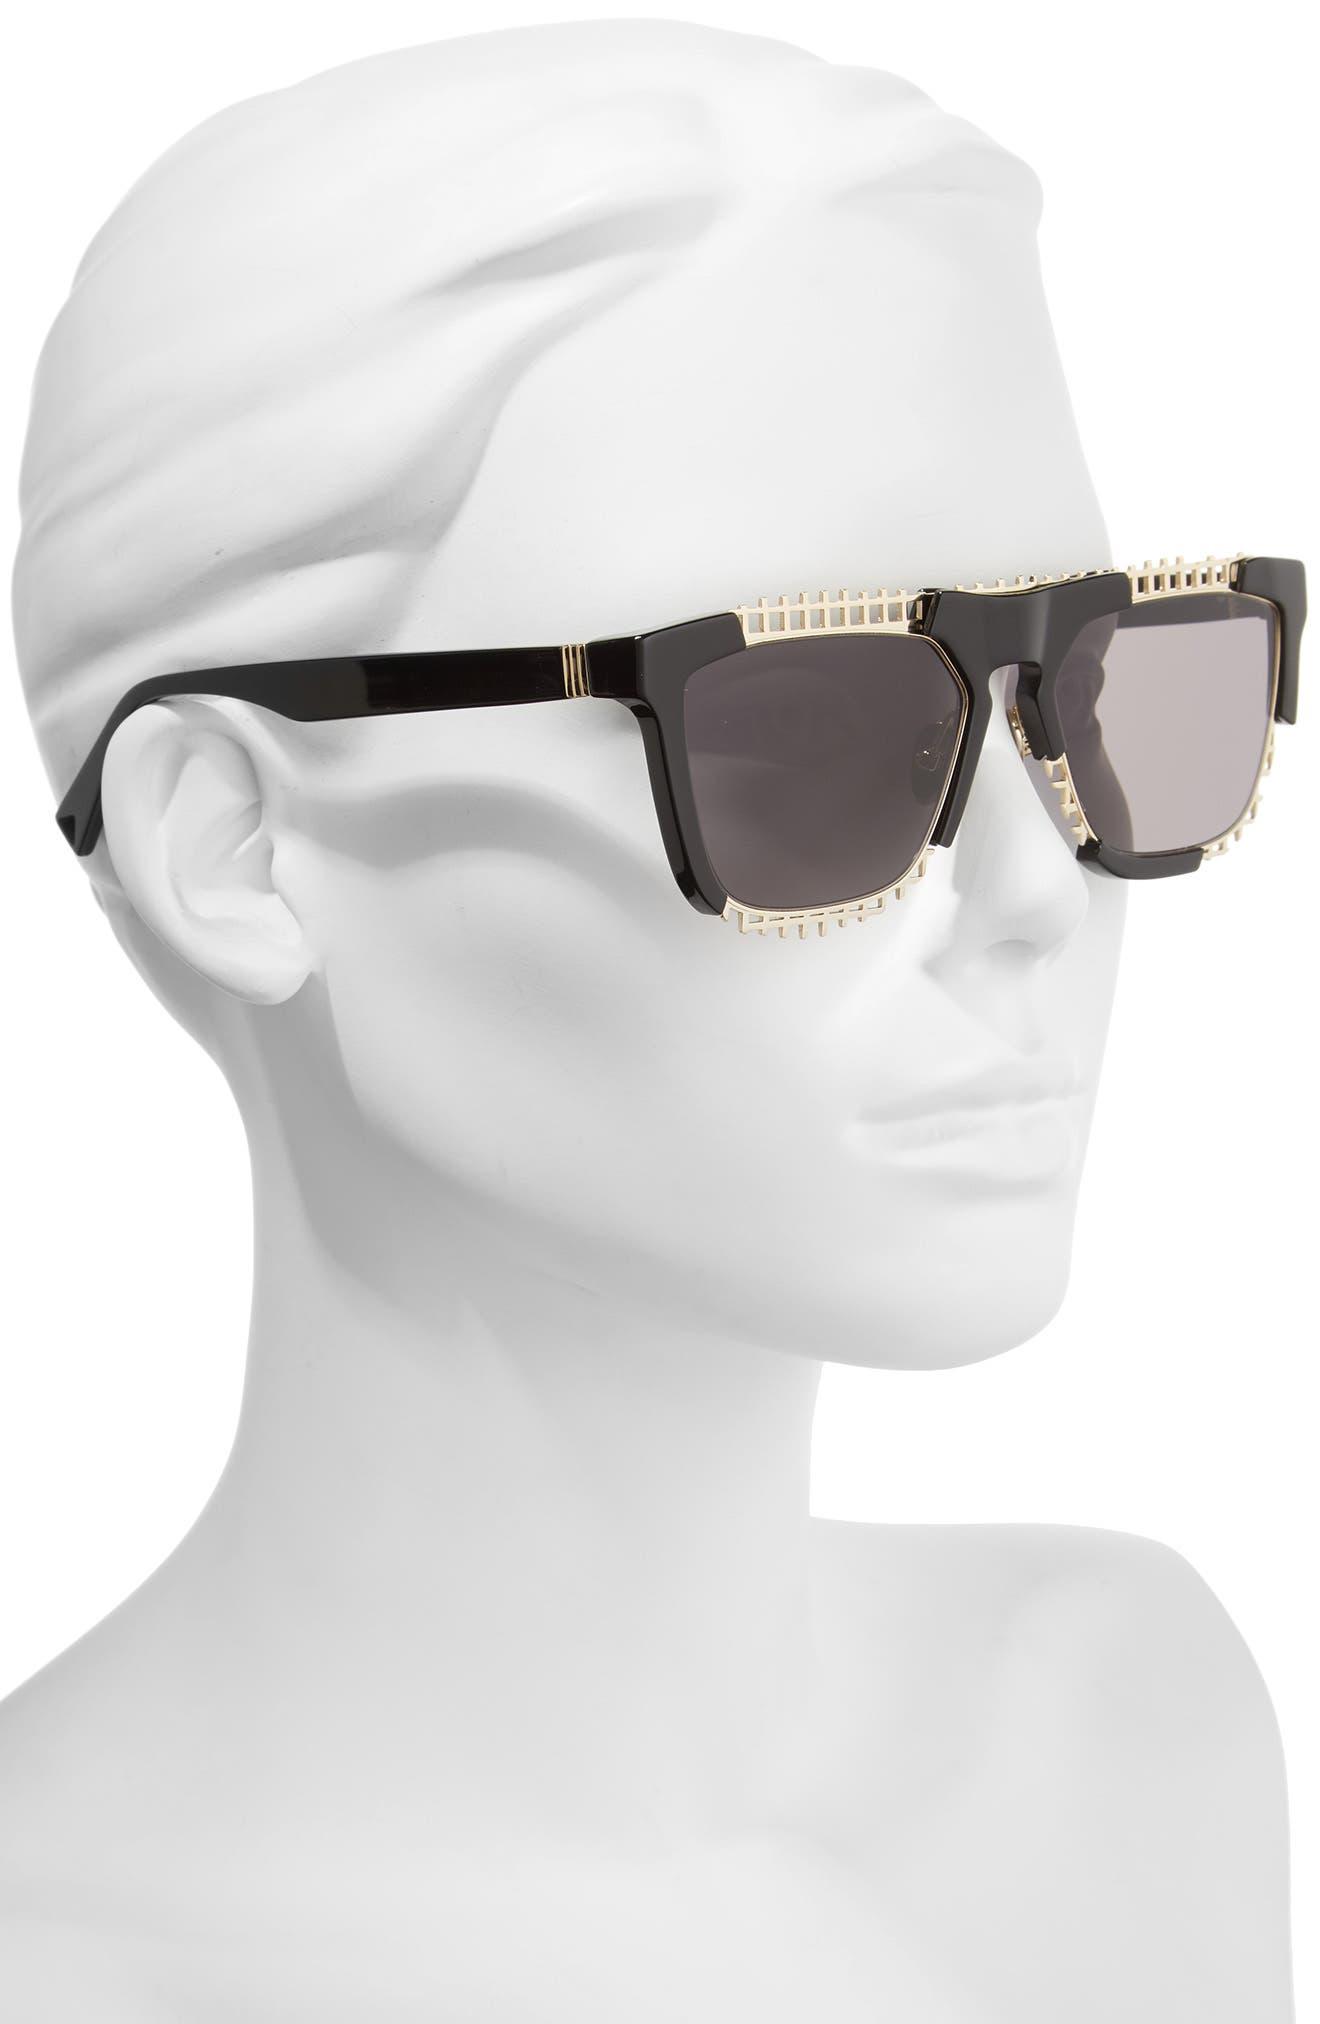 Coz 55mm Square Sunglasses,                             Alternate thumbnail 2, color,                             001